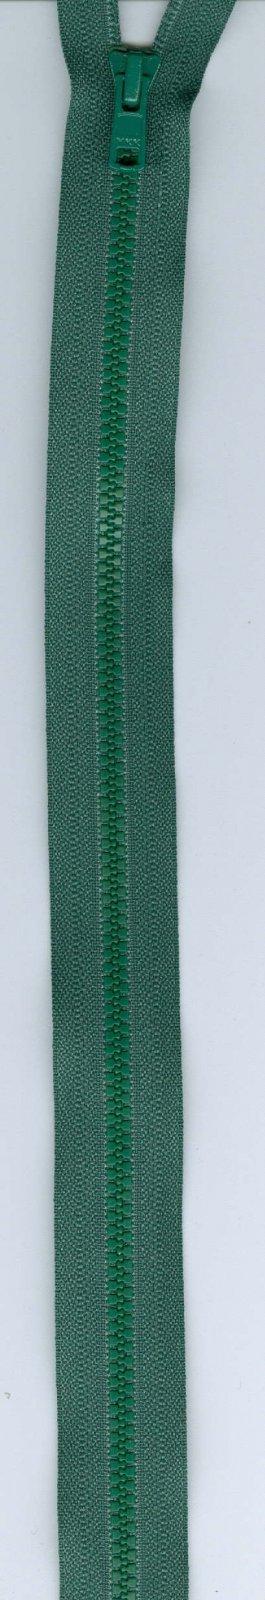 24 Separating Zipper #3 - Hunter Green